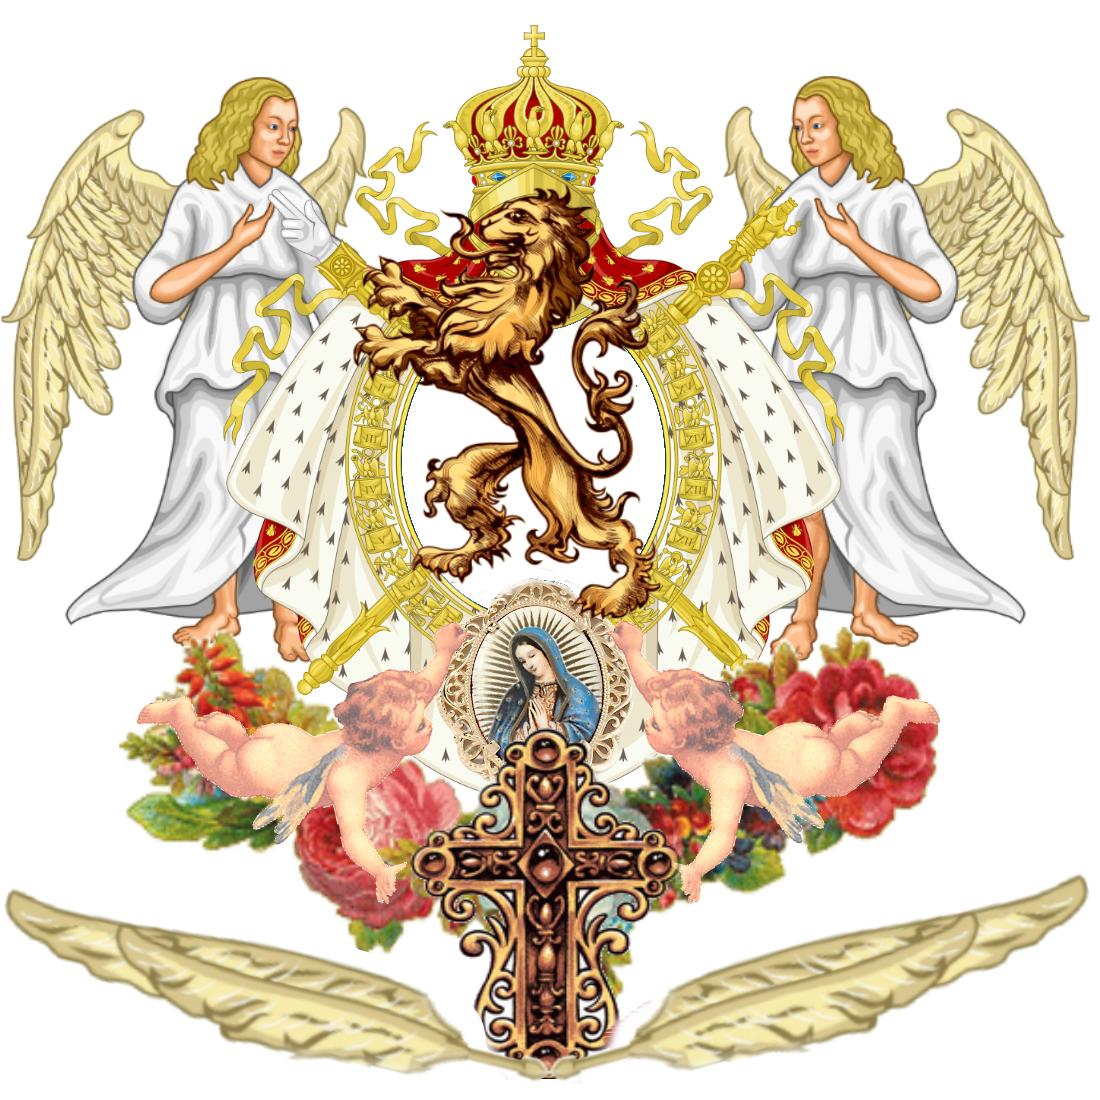 le-plume-de-nostro-sanctus-pater-blason-son-altesse-royal-jose-maria-chavira-ms-adagio-1st-nome-de-plume-jc-angelcraft-1